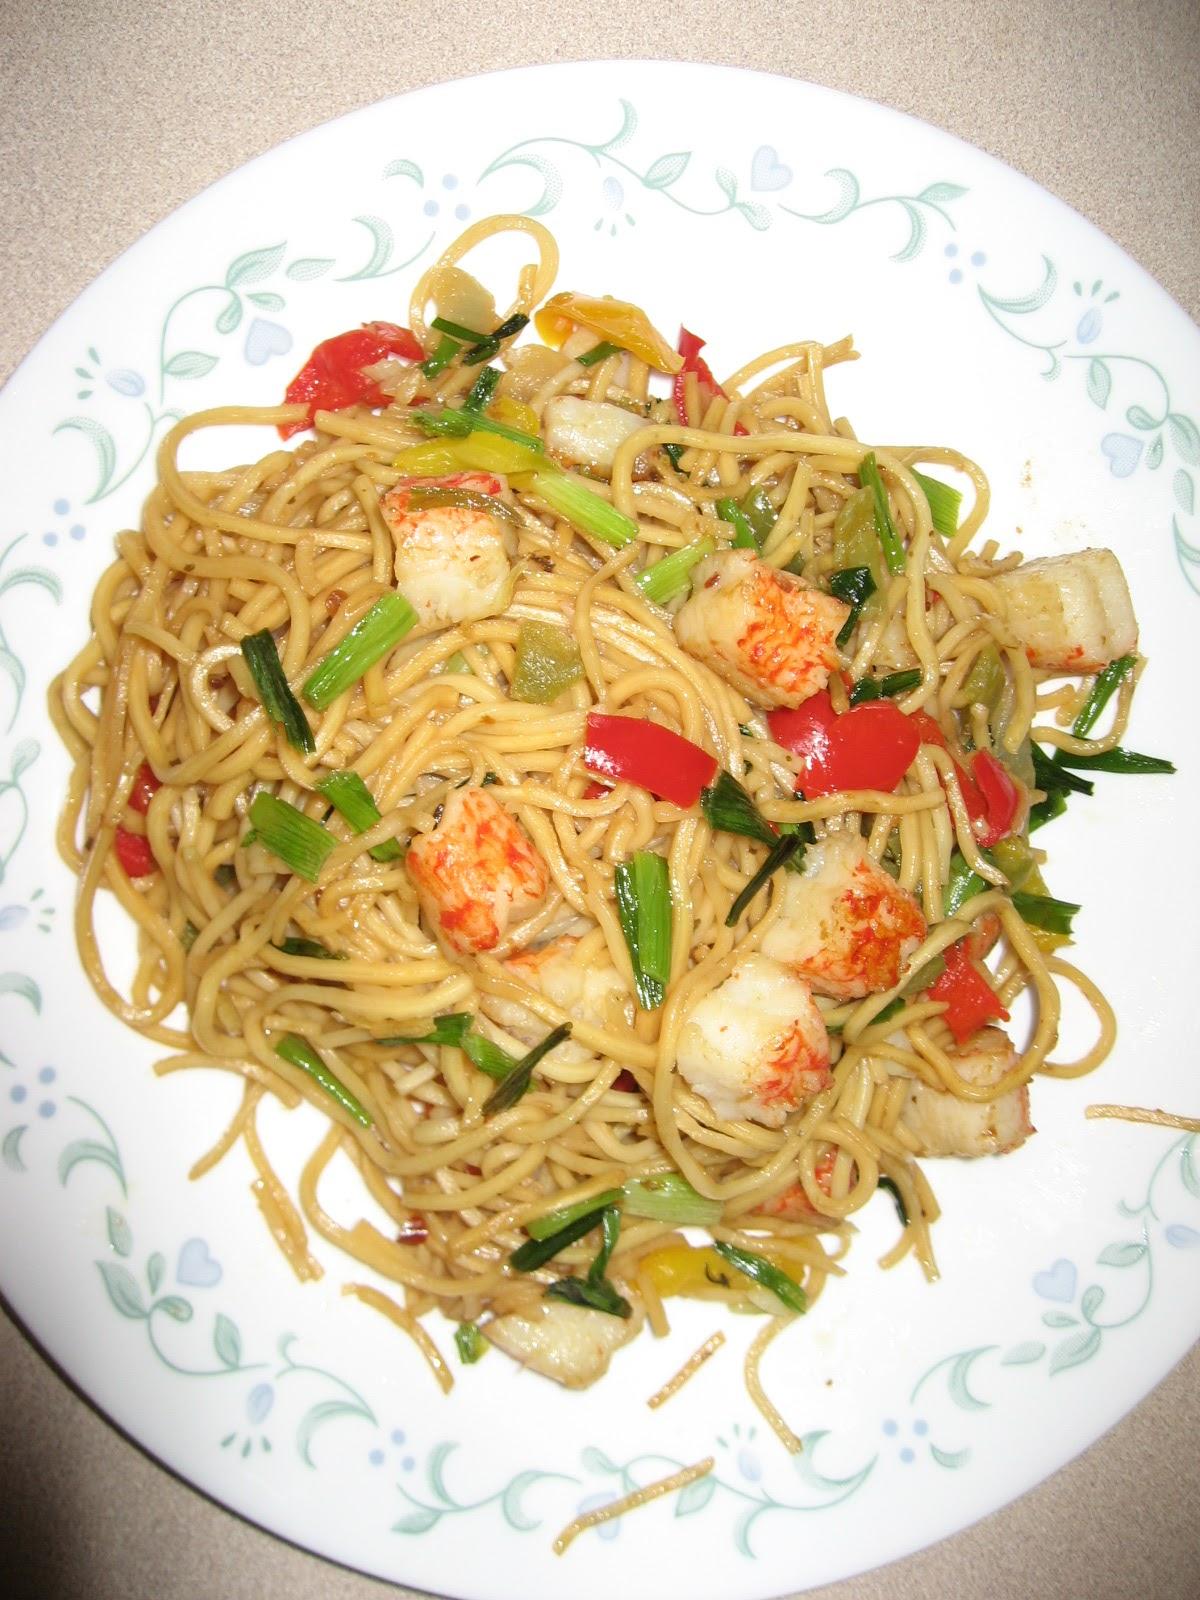 http://4.bp.blogspot.com/-Y0bE6fKAwK4/TrjCztnxYSI/AAAAAAAADVE/Brin7GEBKng/s1600/Jessica+-+noodles.jpg